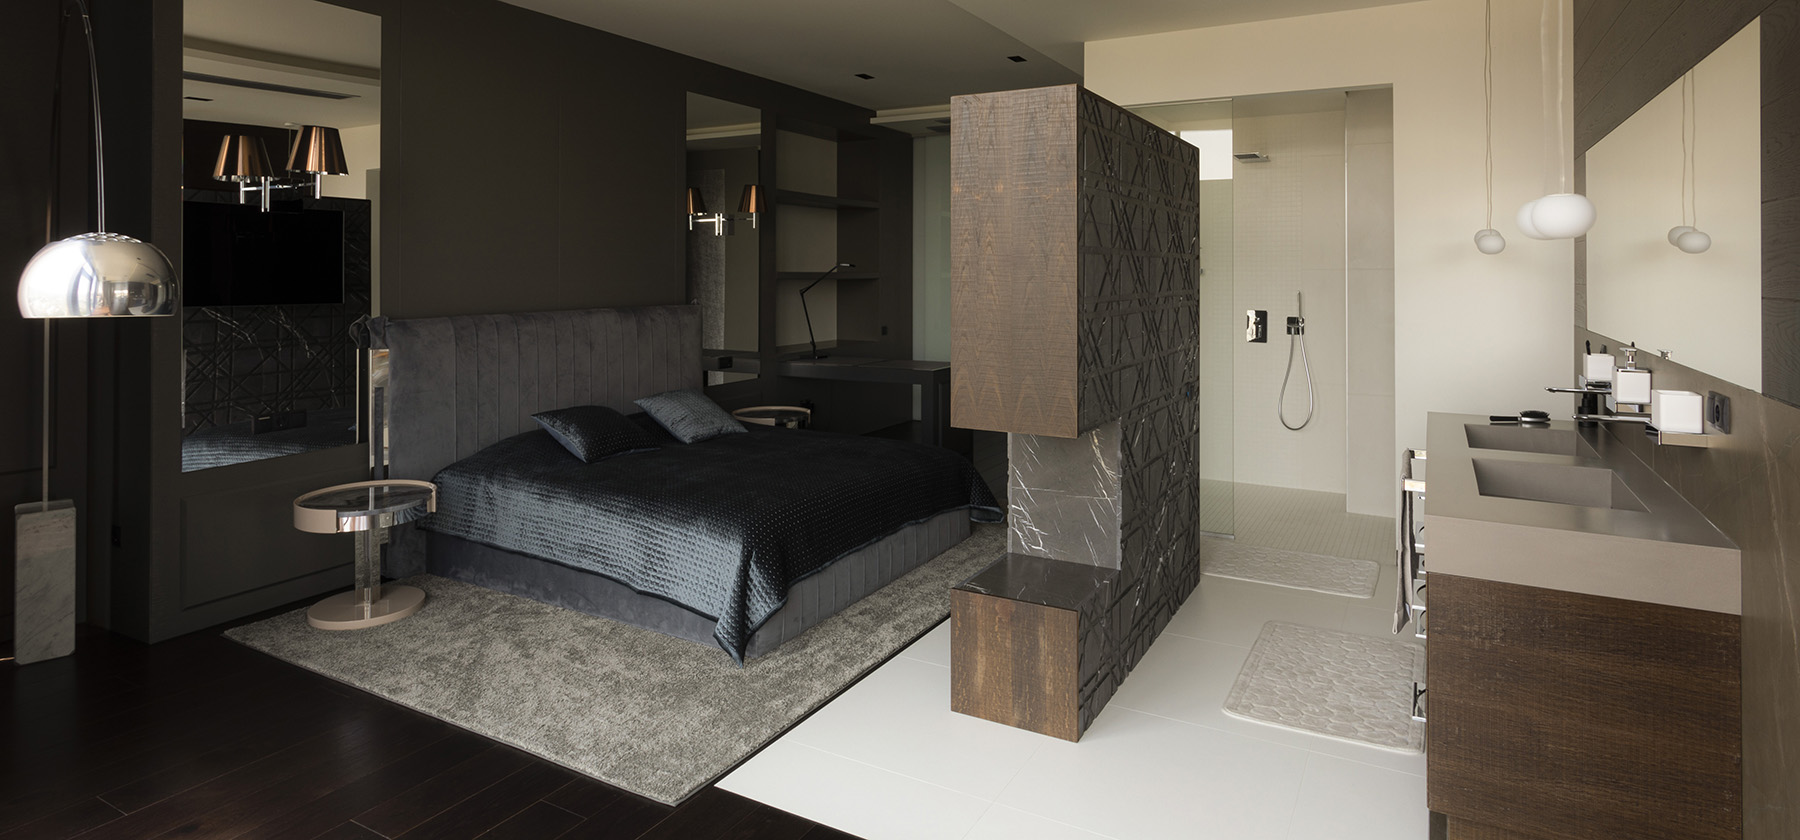 1_KingDavid_tartan_interior_wall_covering